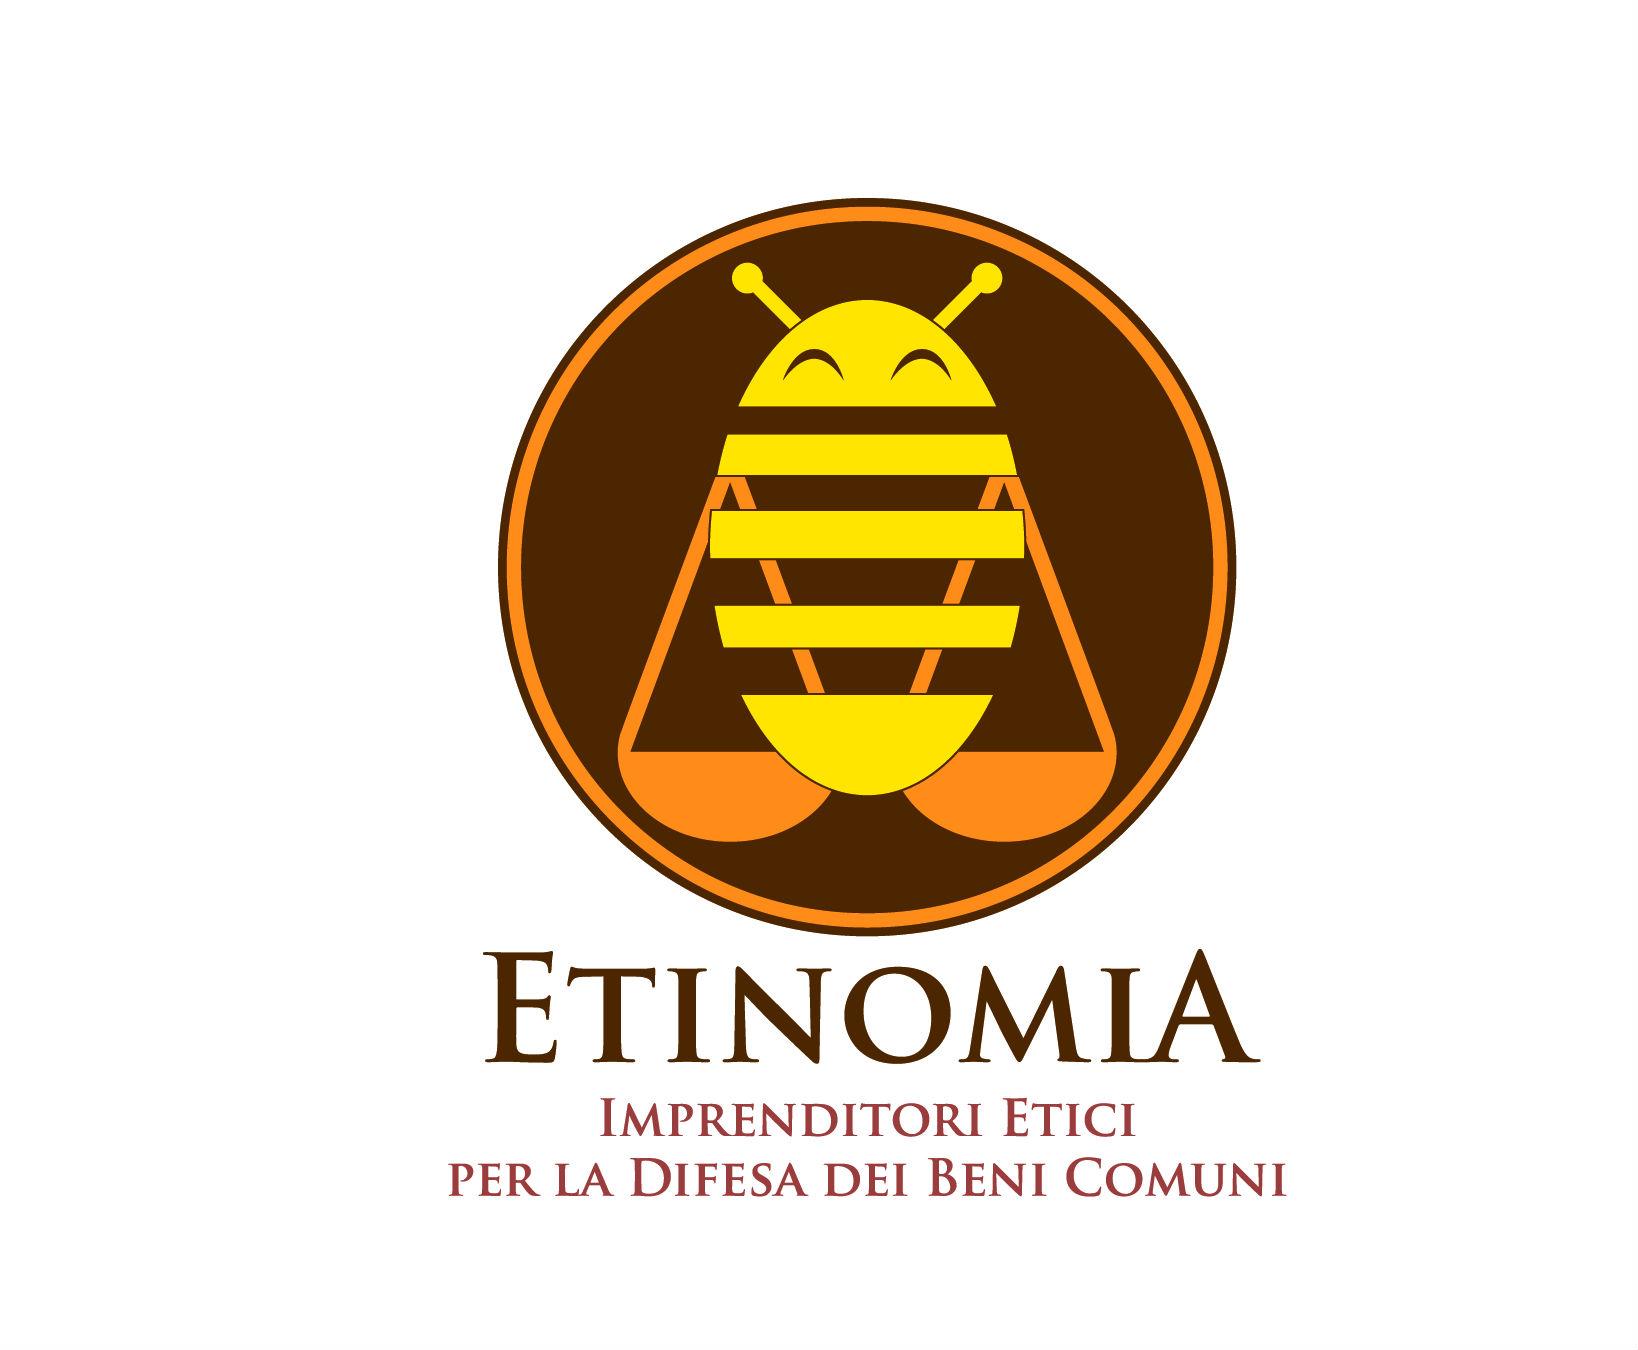 Etinomia